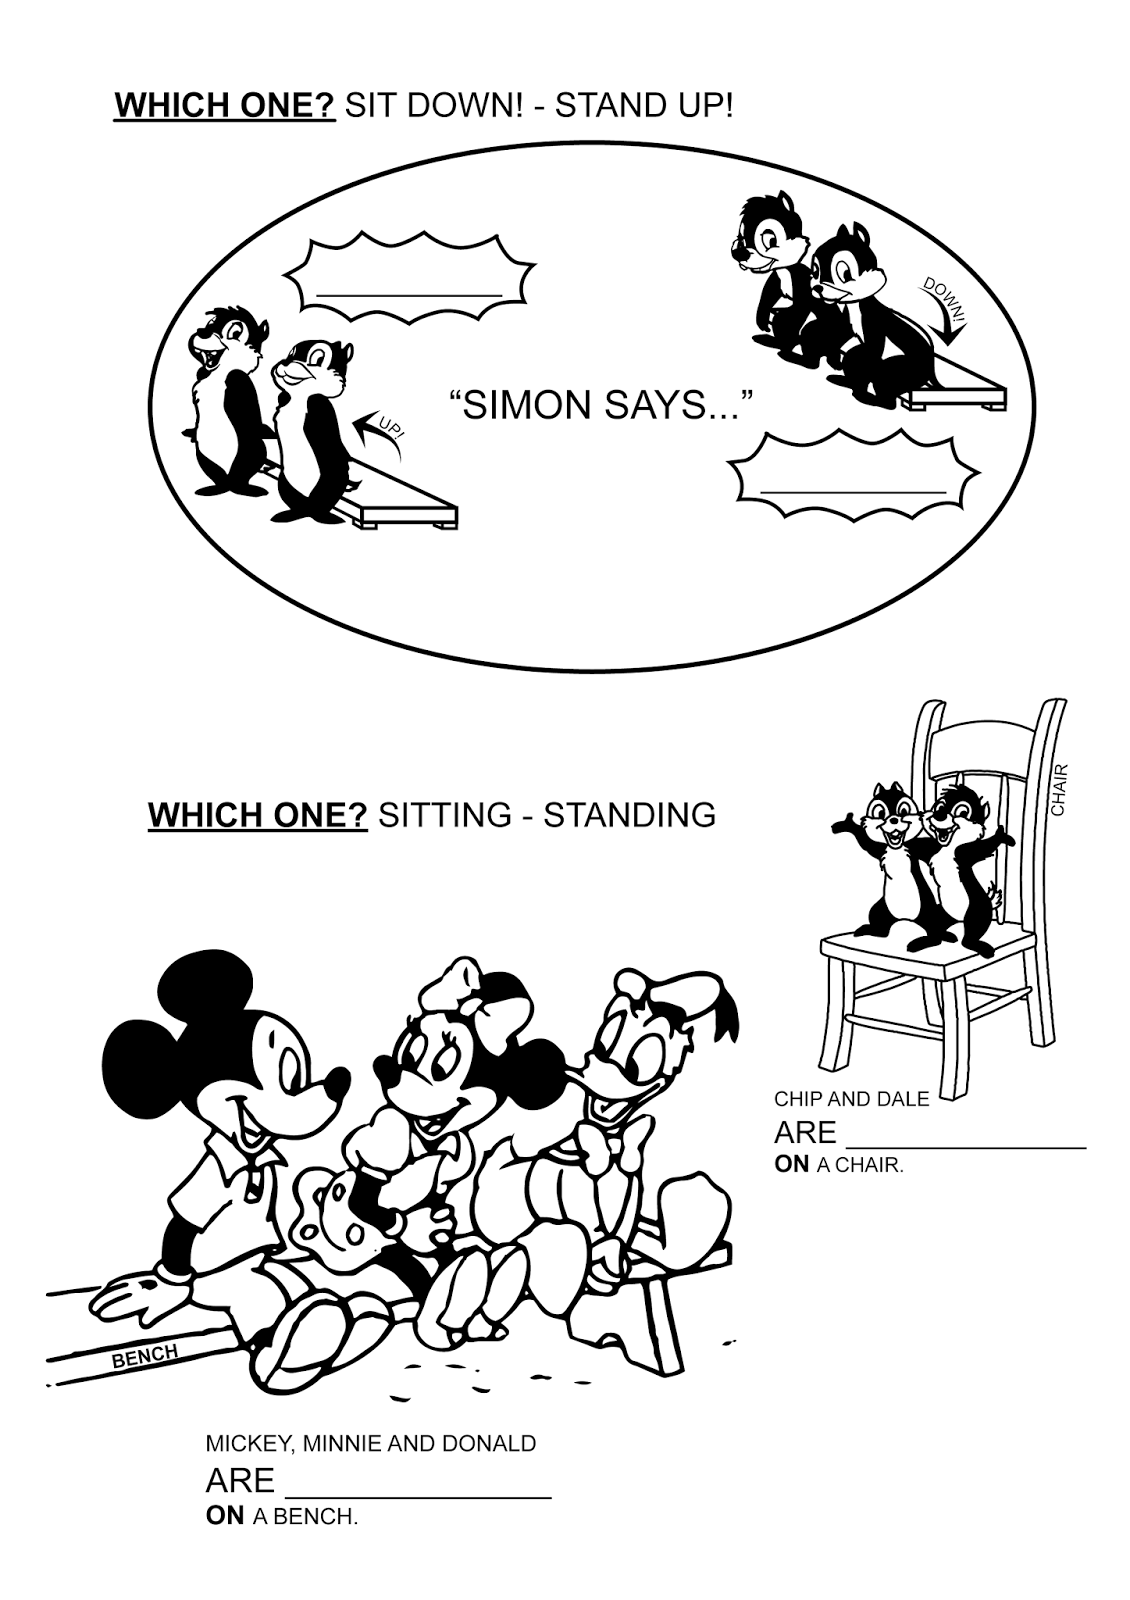 Paginas Para Colorear Originales Original Coloring Pages Stand Up And Sit Down